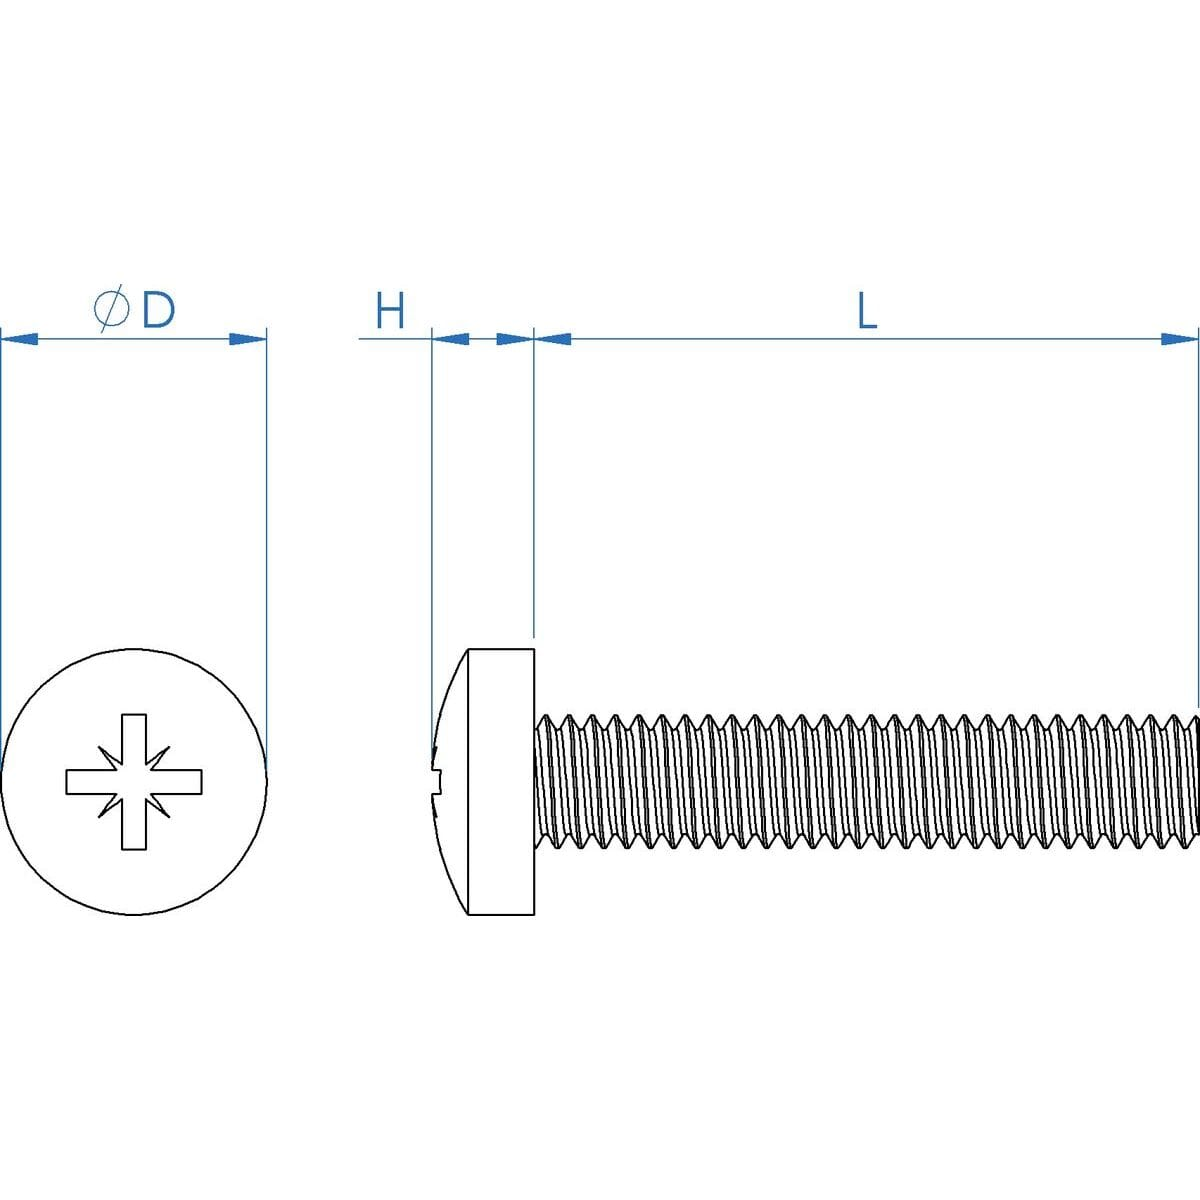 M6 x 14mm Pozi Pan Head Screws (DIN 7985Z) - Marine Stainless Steel (A4) Drawing